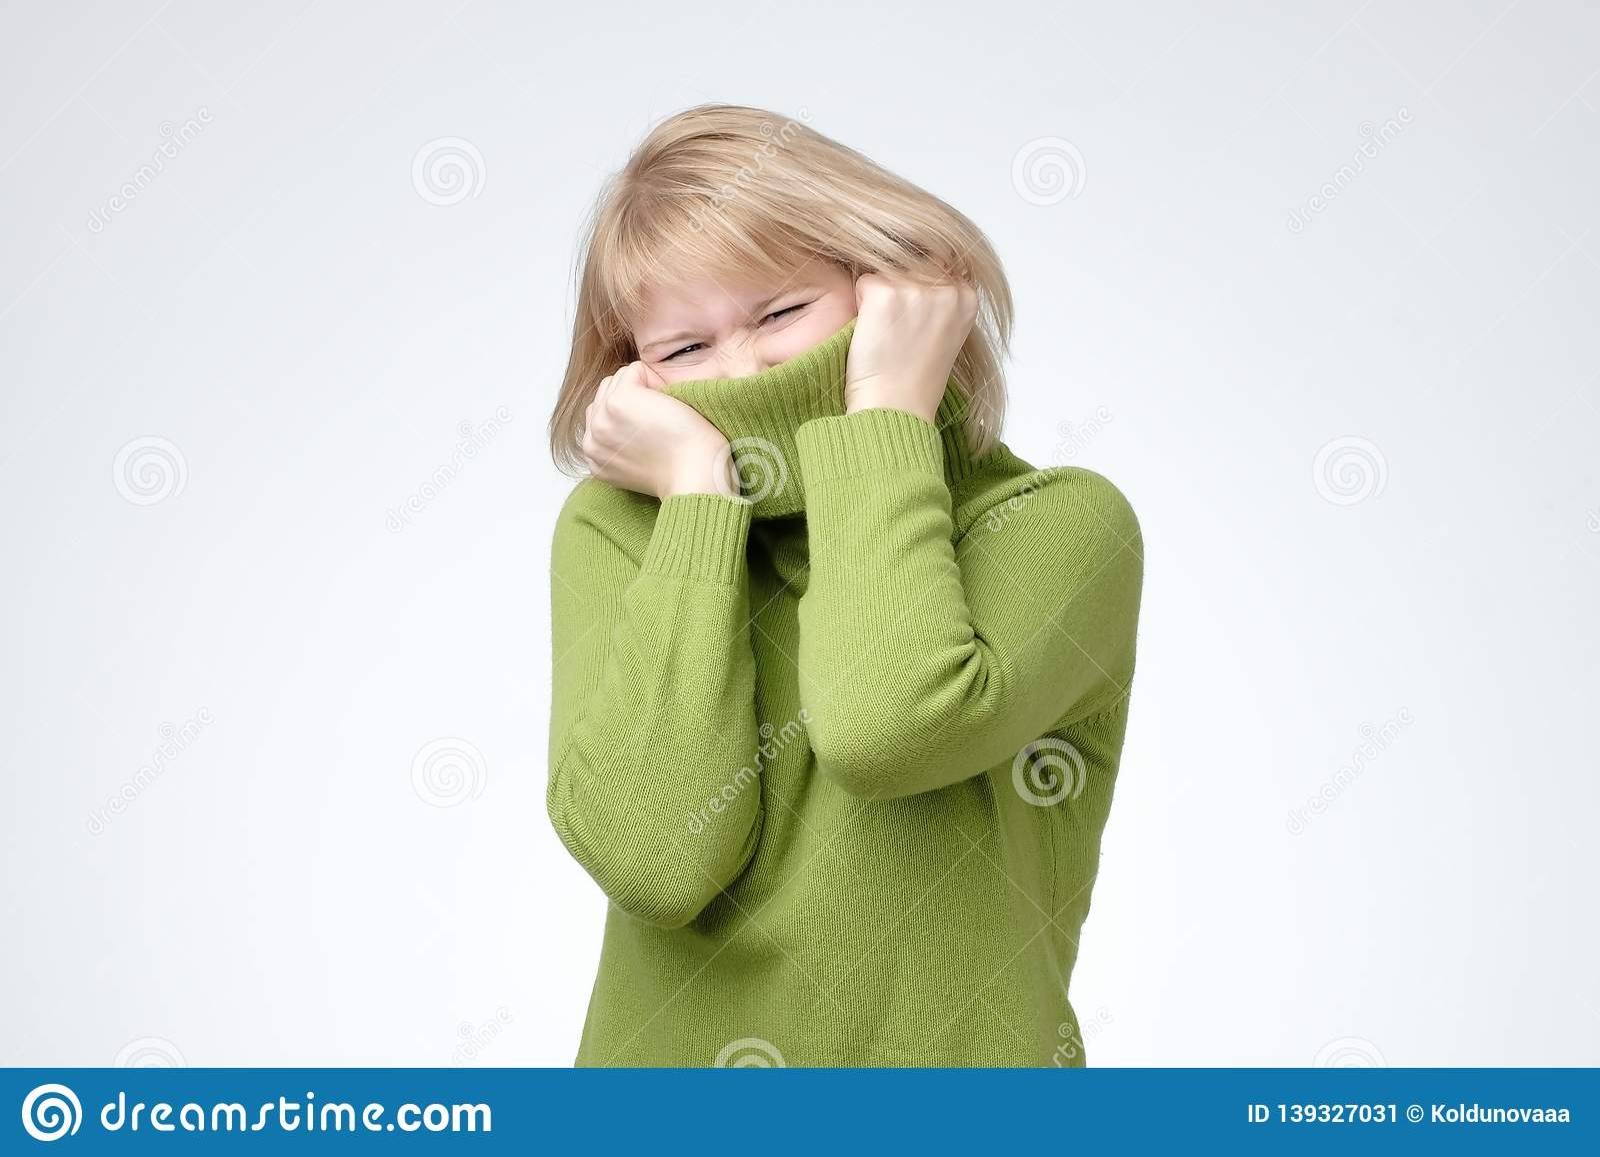 Girl pulling her trendy green sweater over head having fun.